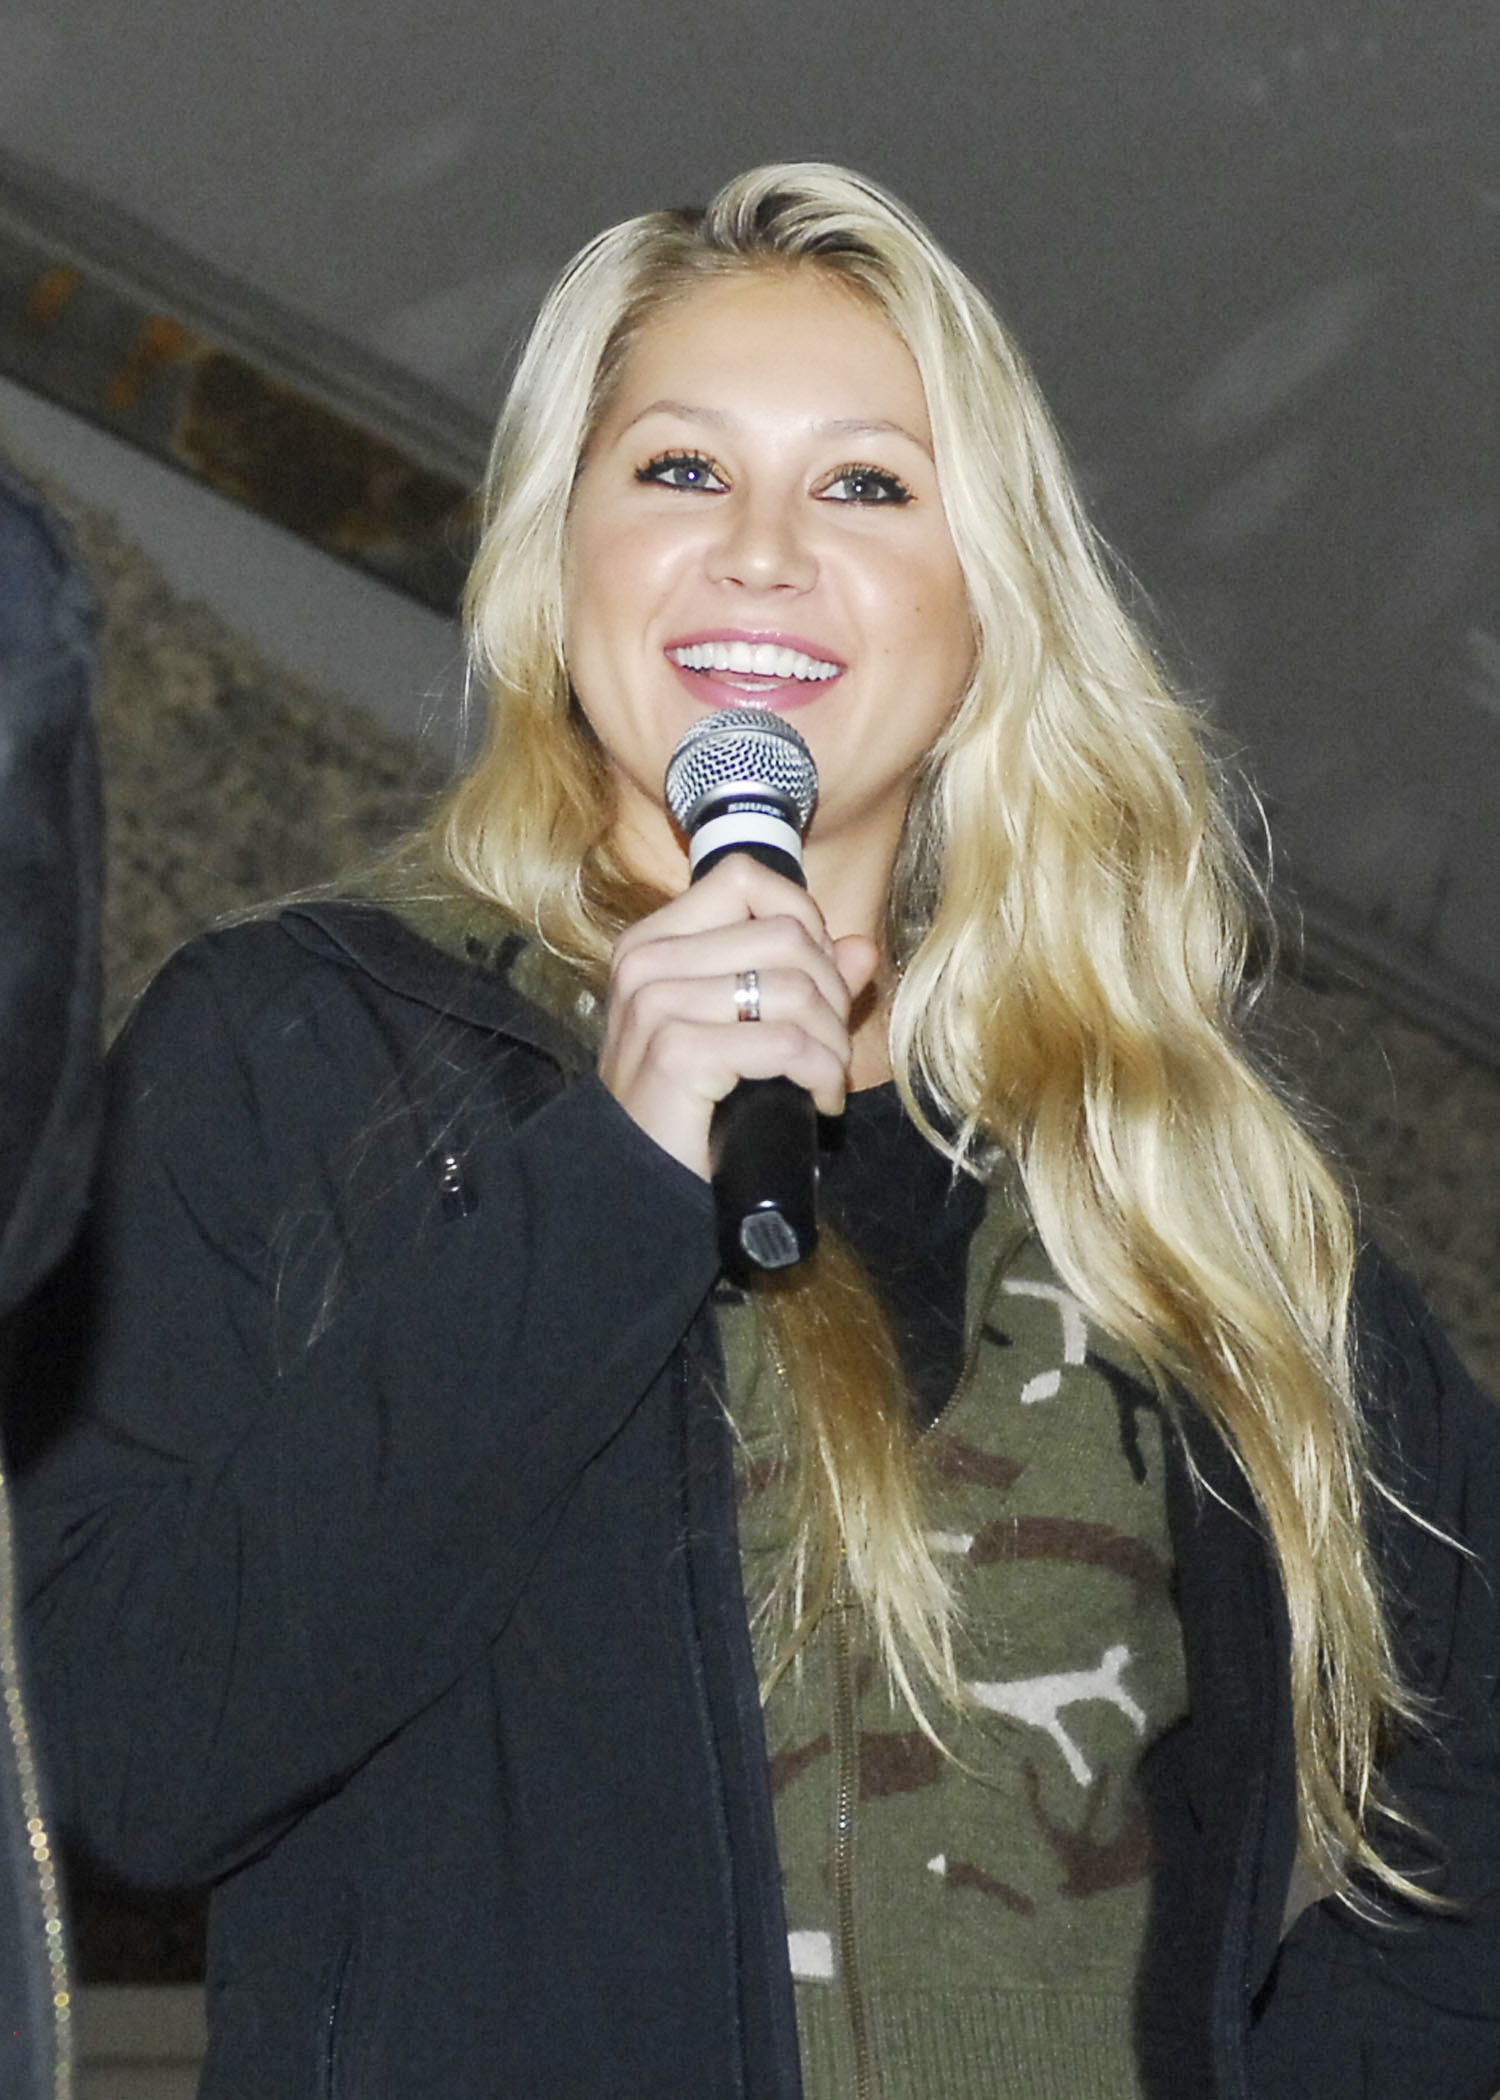 Photo of Anna Kournikova: Russian tennis player and model